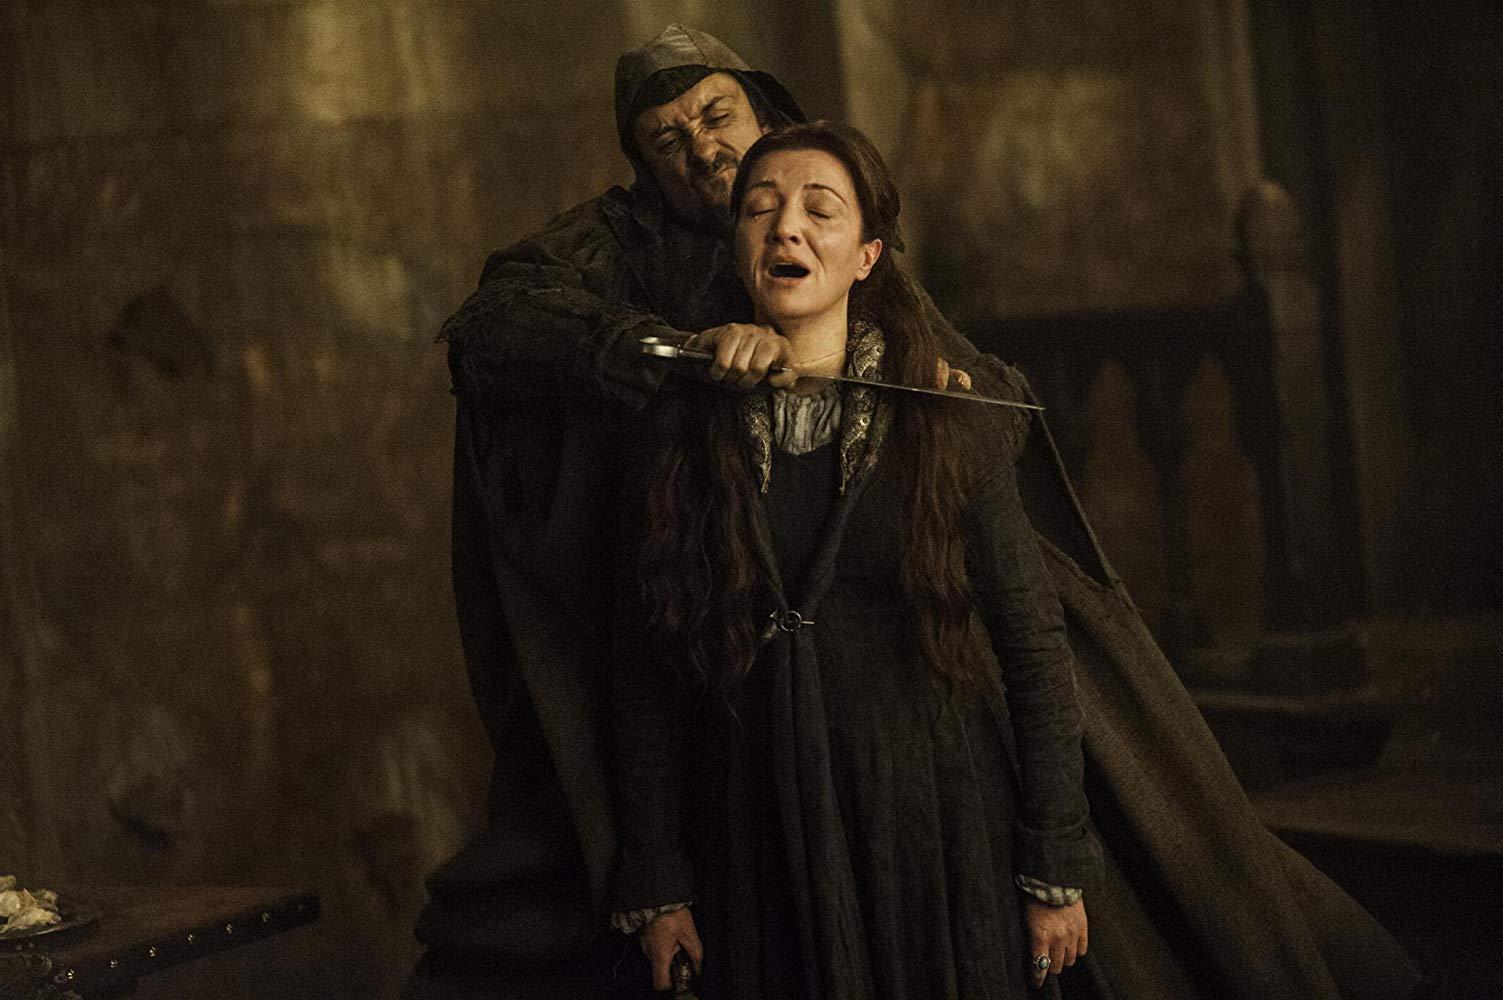 Michelle Fairley em cena do episódio 9 da temporada 3 de' Game of Thrones'